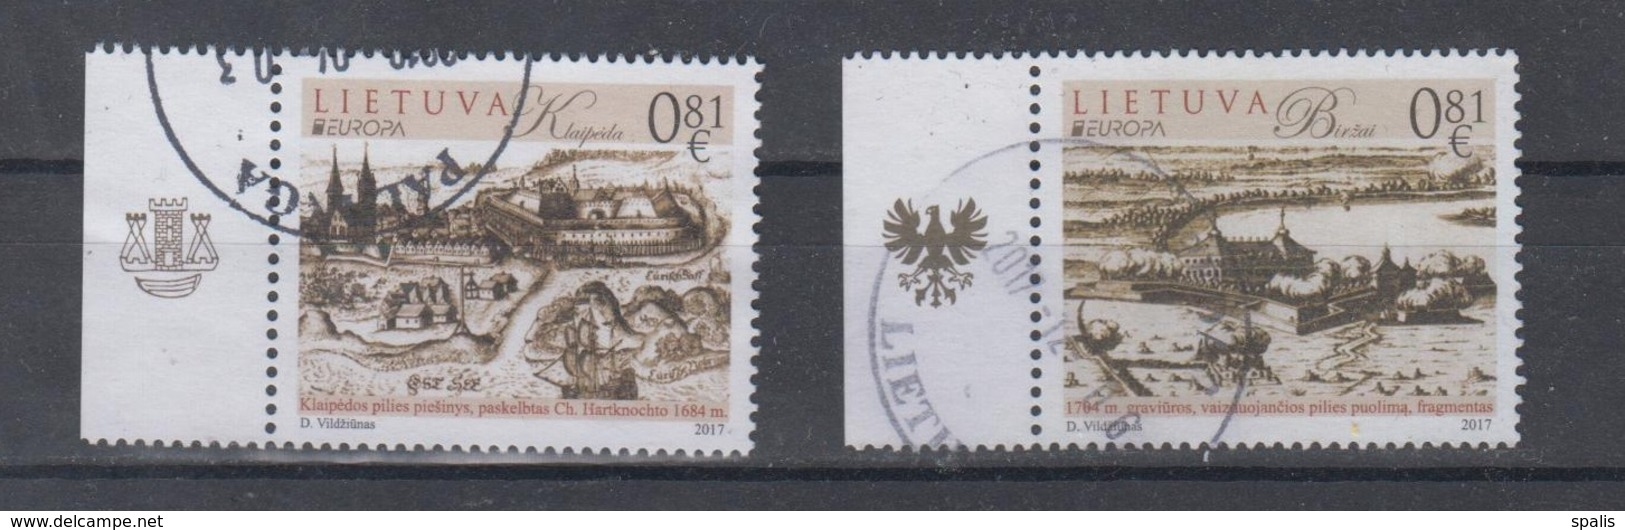 Lithuania 2017 Mi 1250-1 Used Europa,castles - Lithuania